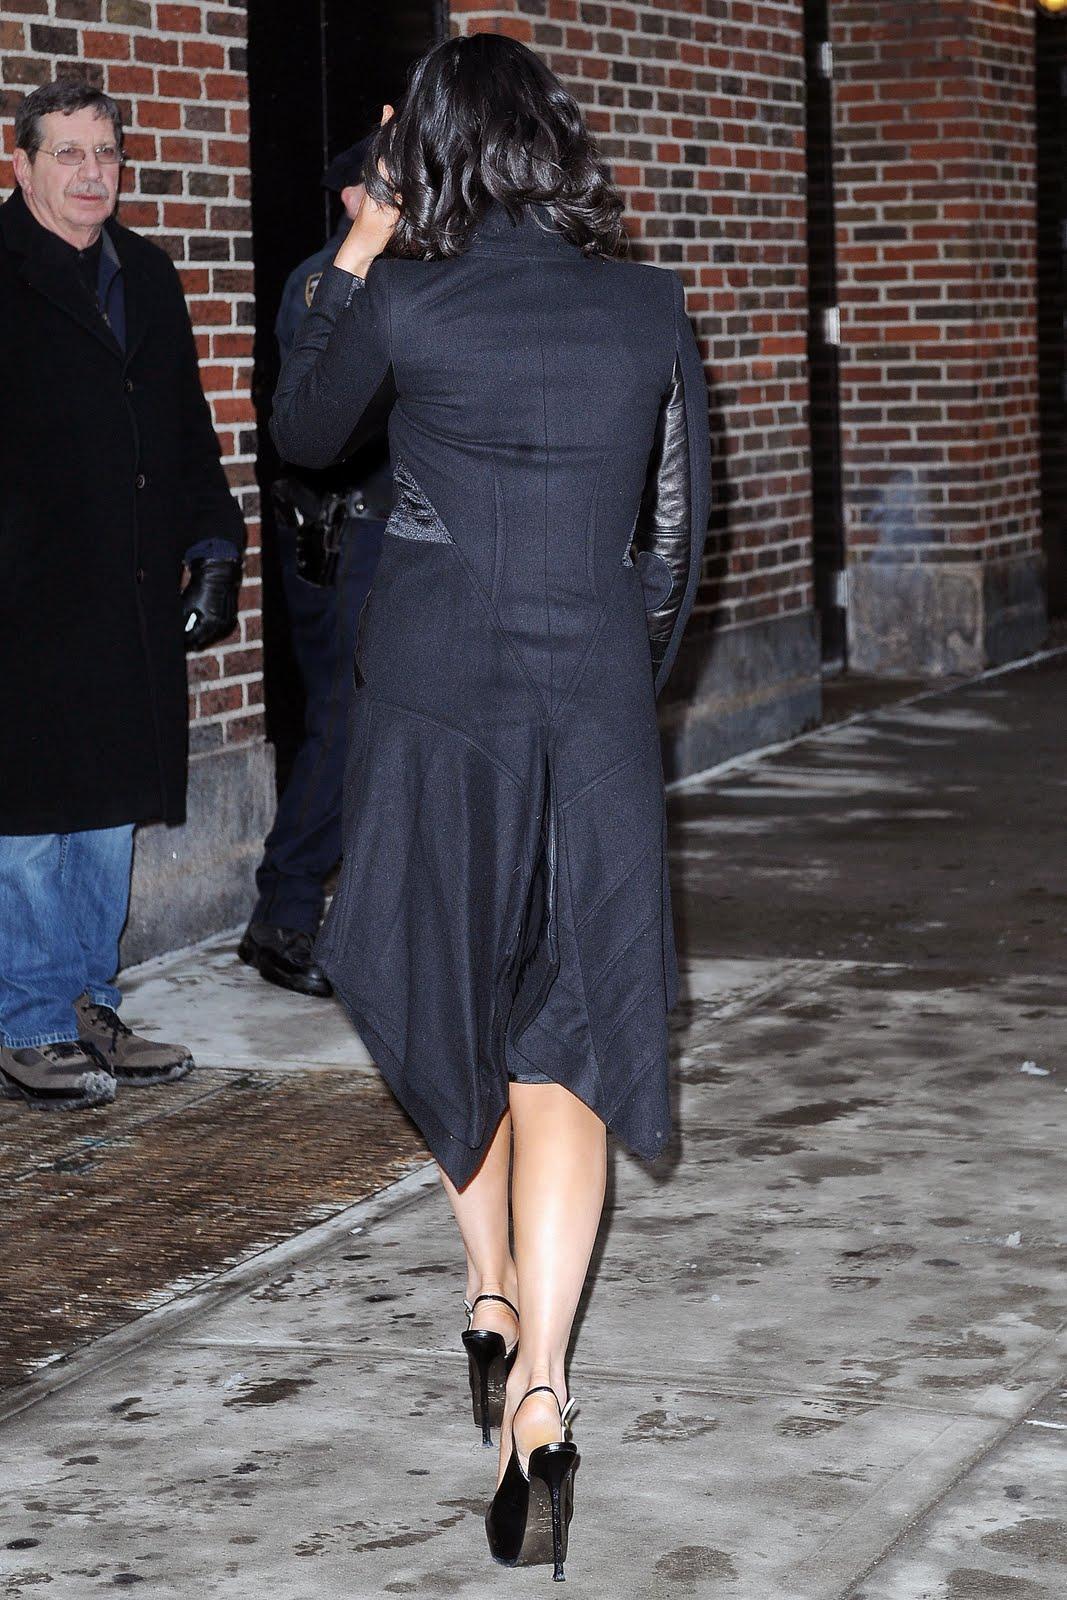 Celebrity Whereabouts Olivia Munn Outside The Ed Sullivan